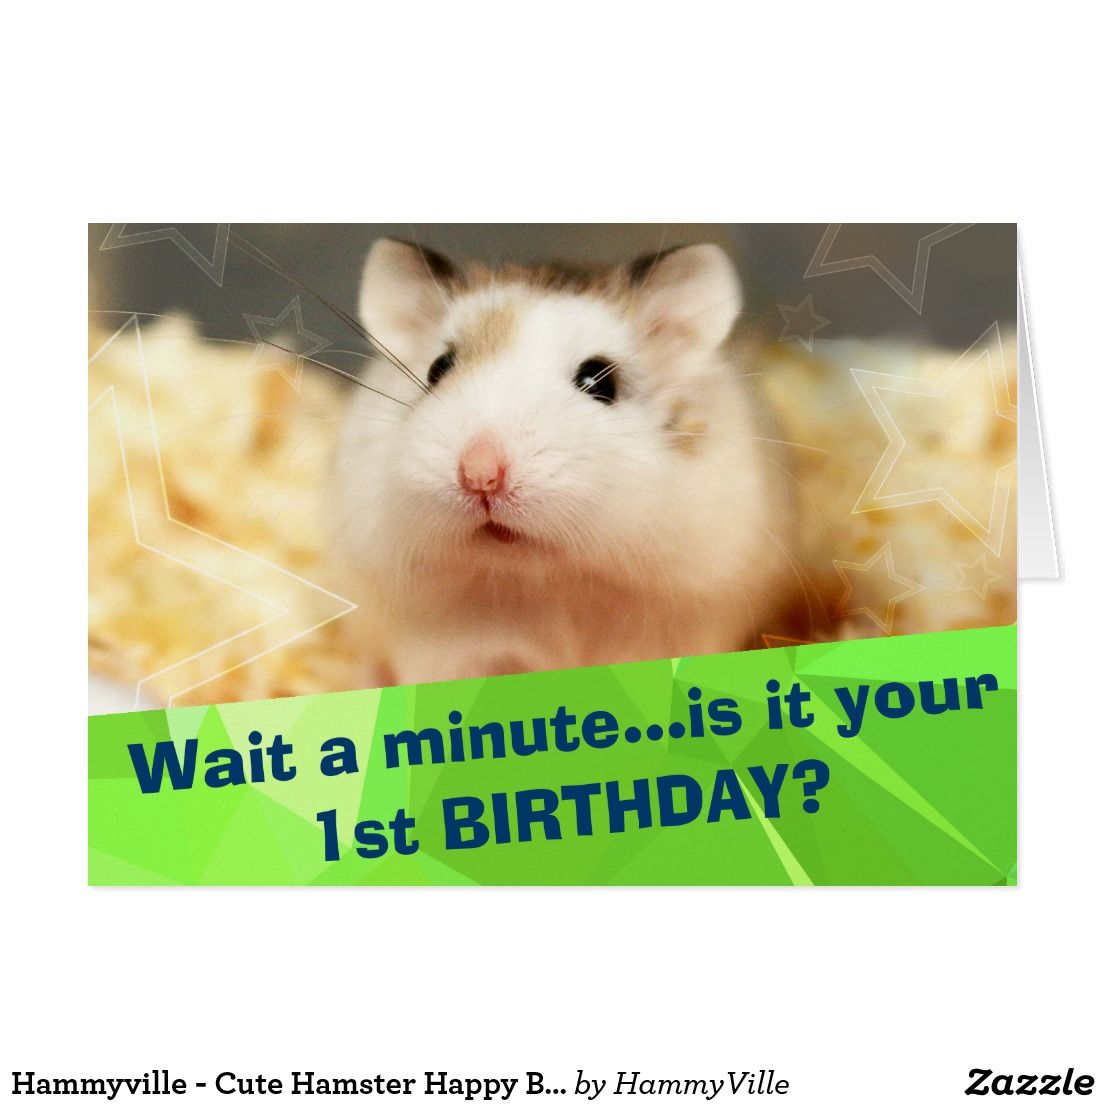 Hammyville Cute Hamster Happy Birthday Card Zazzle Com Cute Hamsters Happy Birthday Cards Birthday Cards